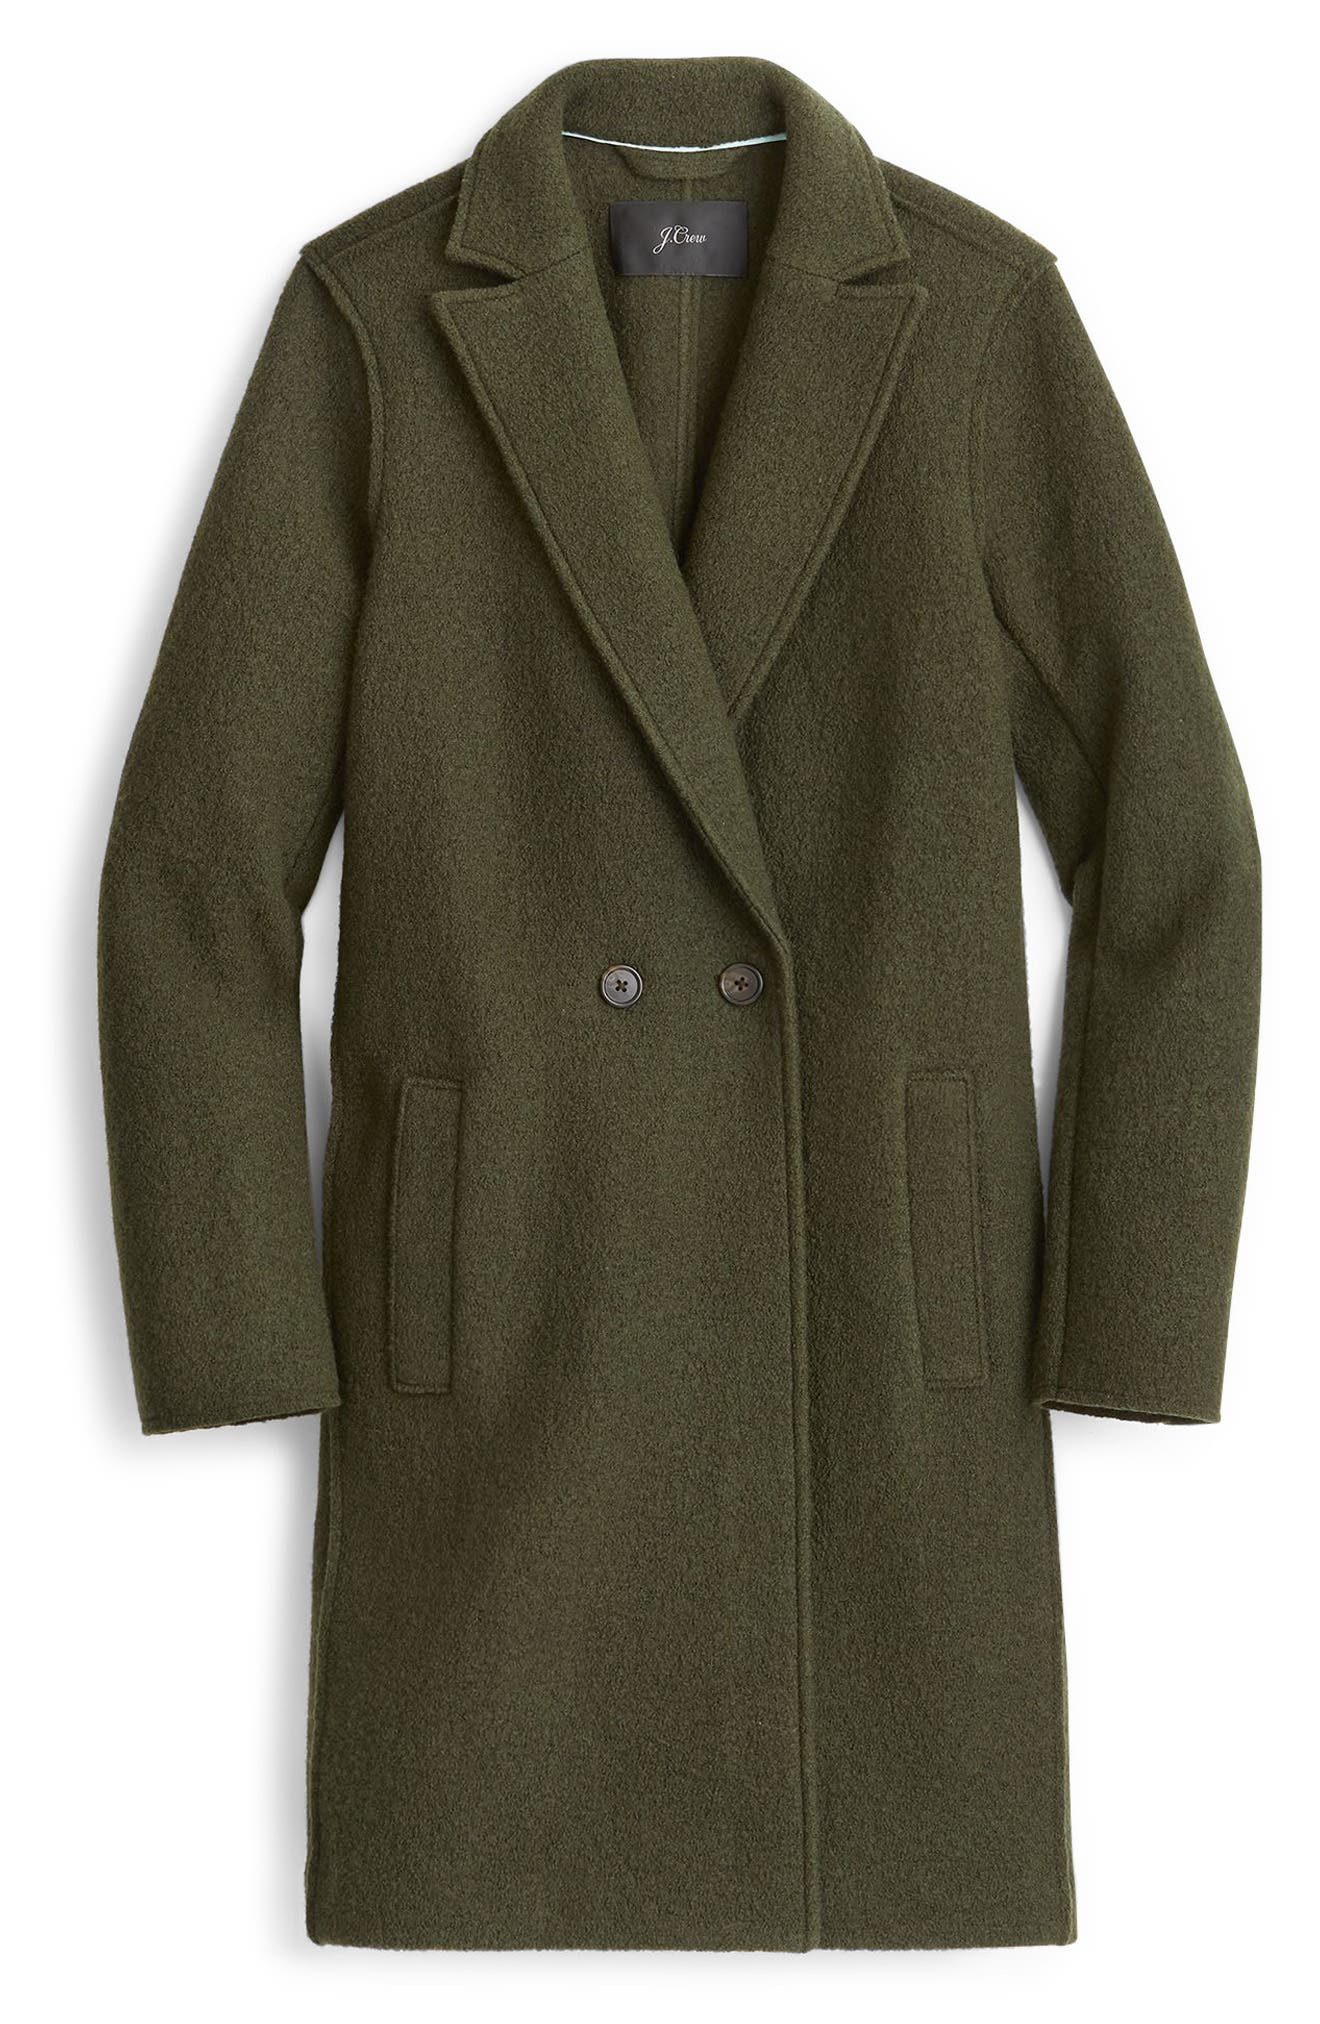 J.CREW,                             Daphne Boiled Wool Topcoat,                             Alternate thumbnail 6, color,                             301